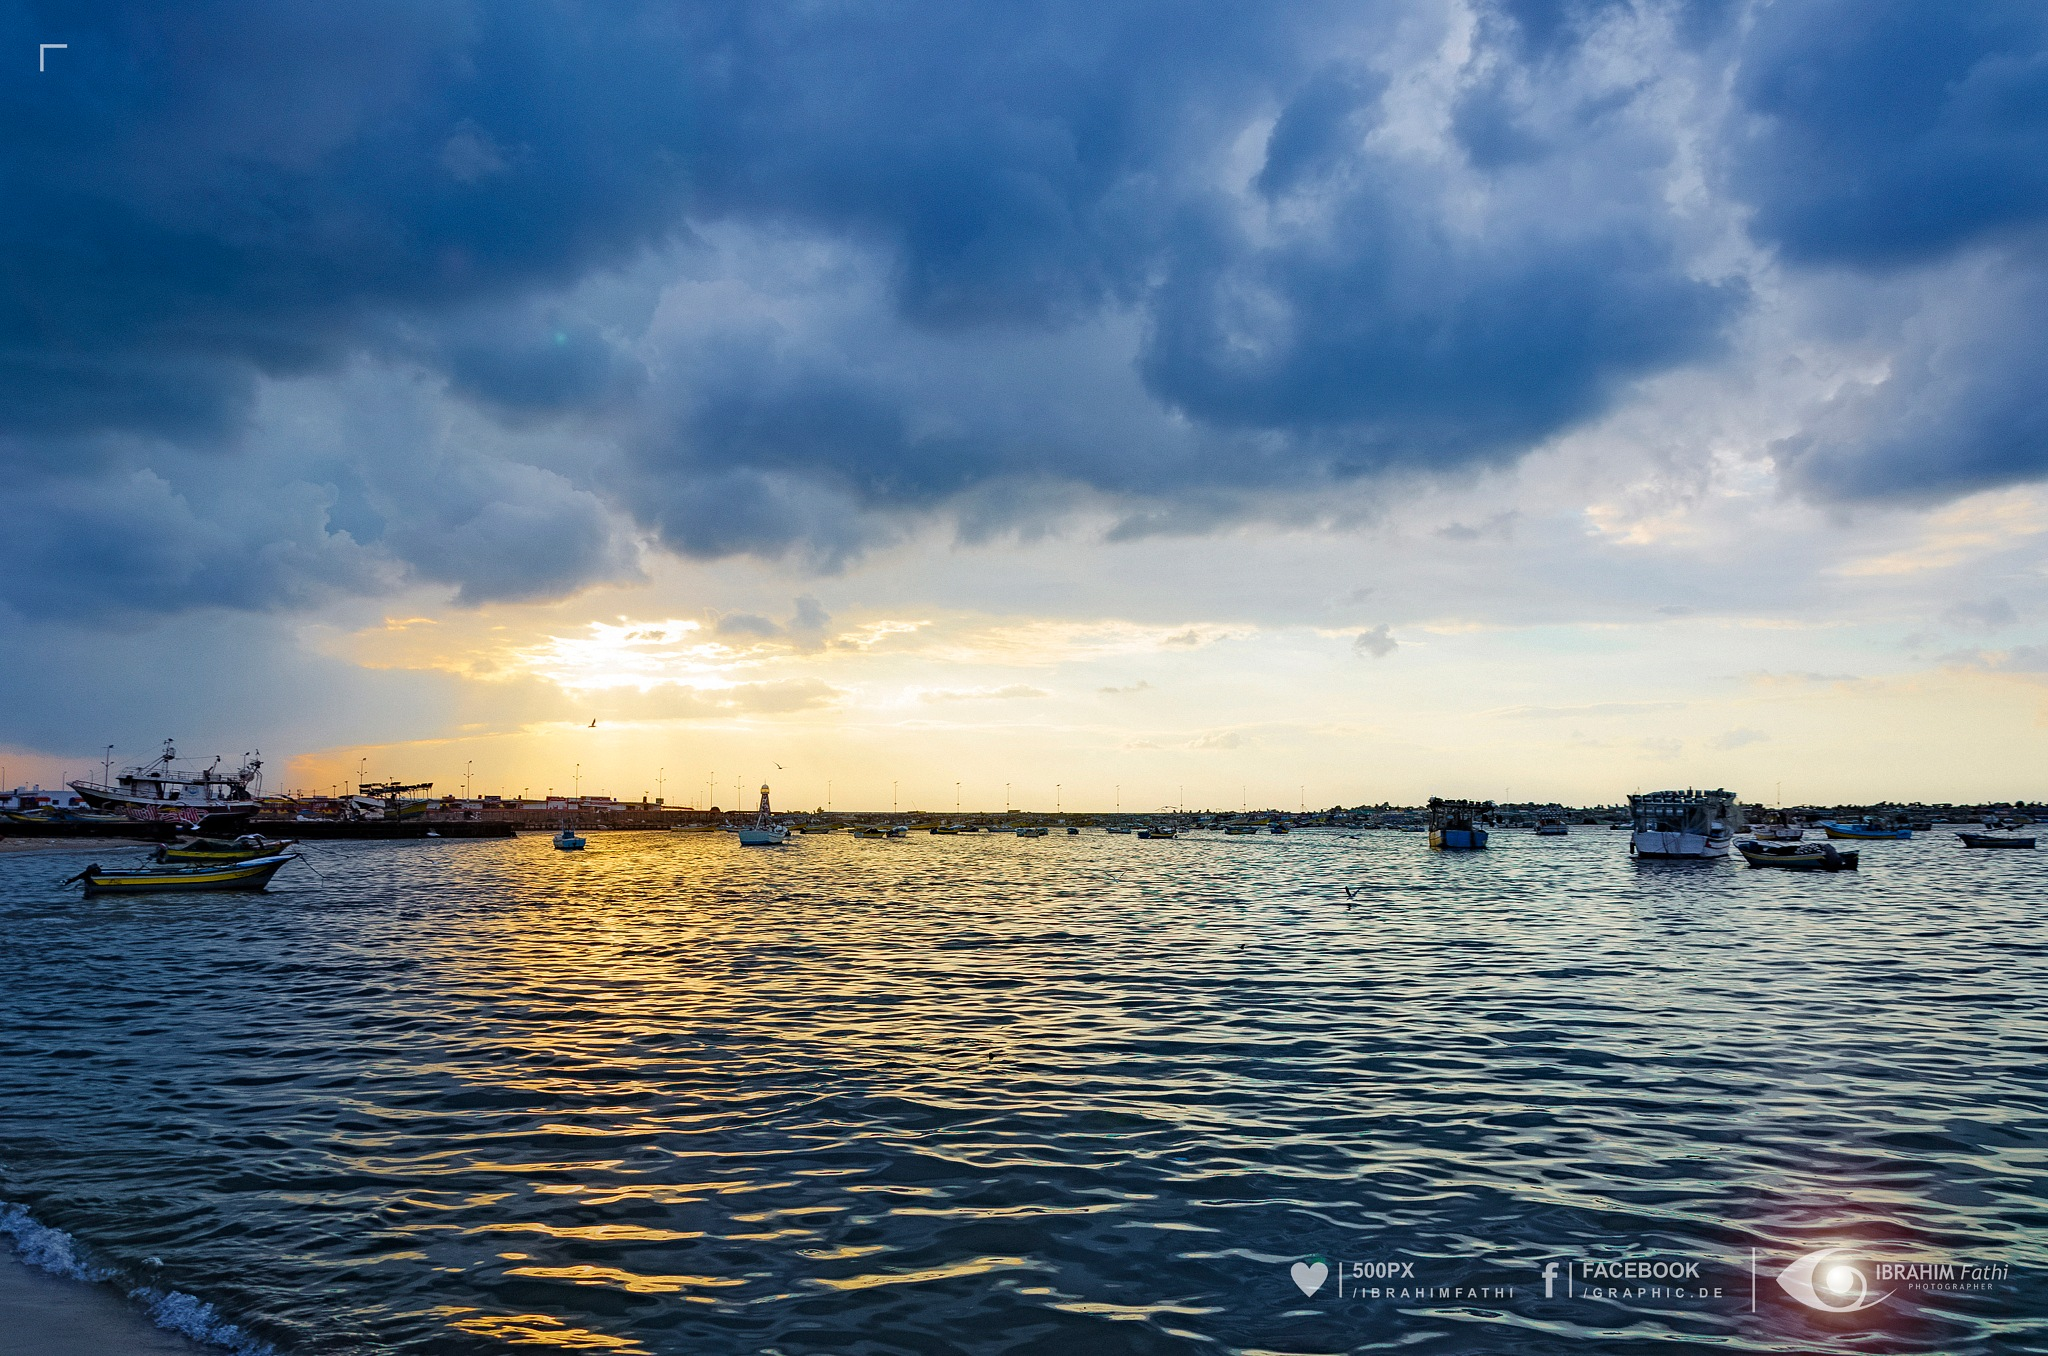 Port of Gaza by Ibrahim Fathi